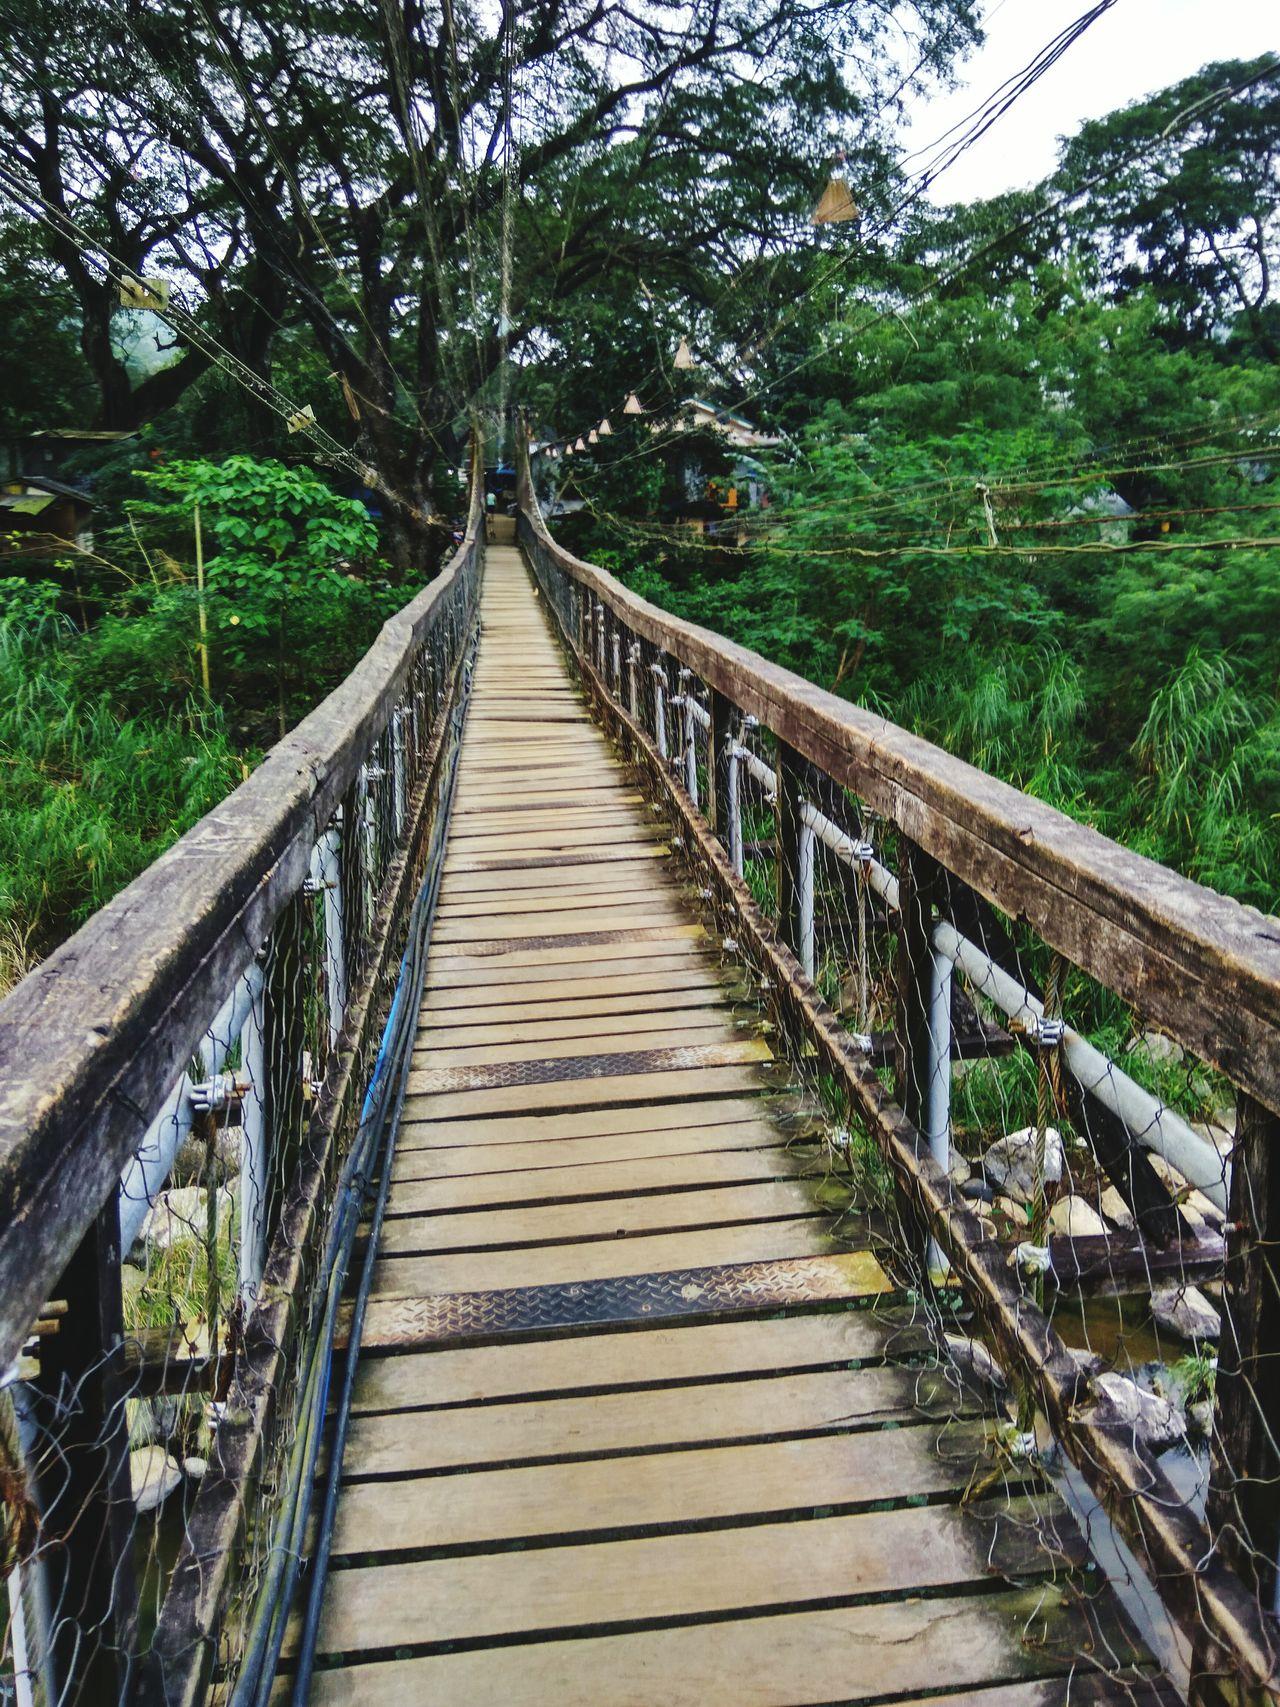 Bridge Footbridge Nature Mt. Pamintinan Road Relax Tree Rizal